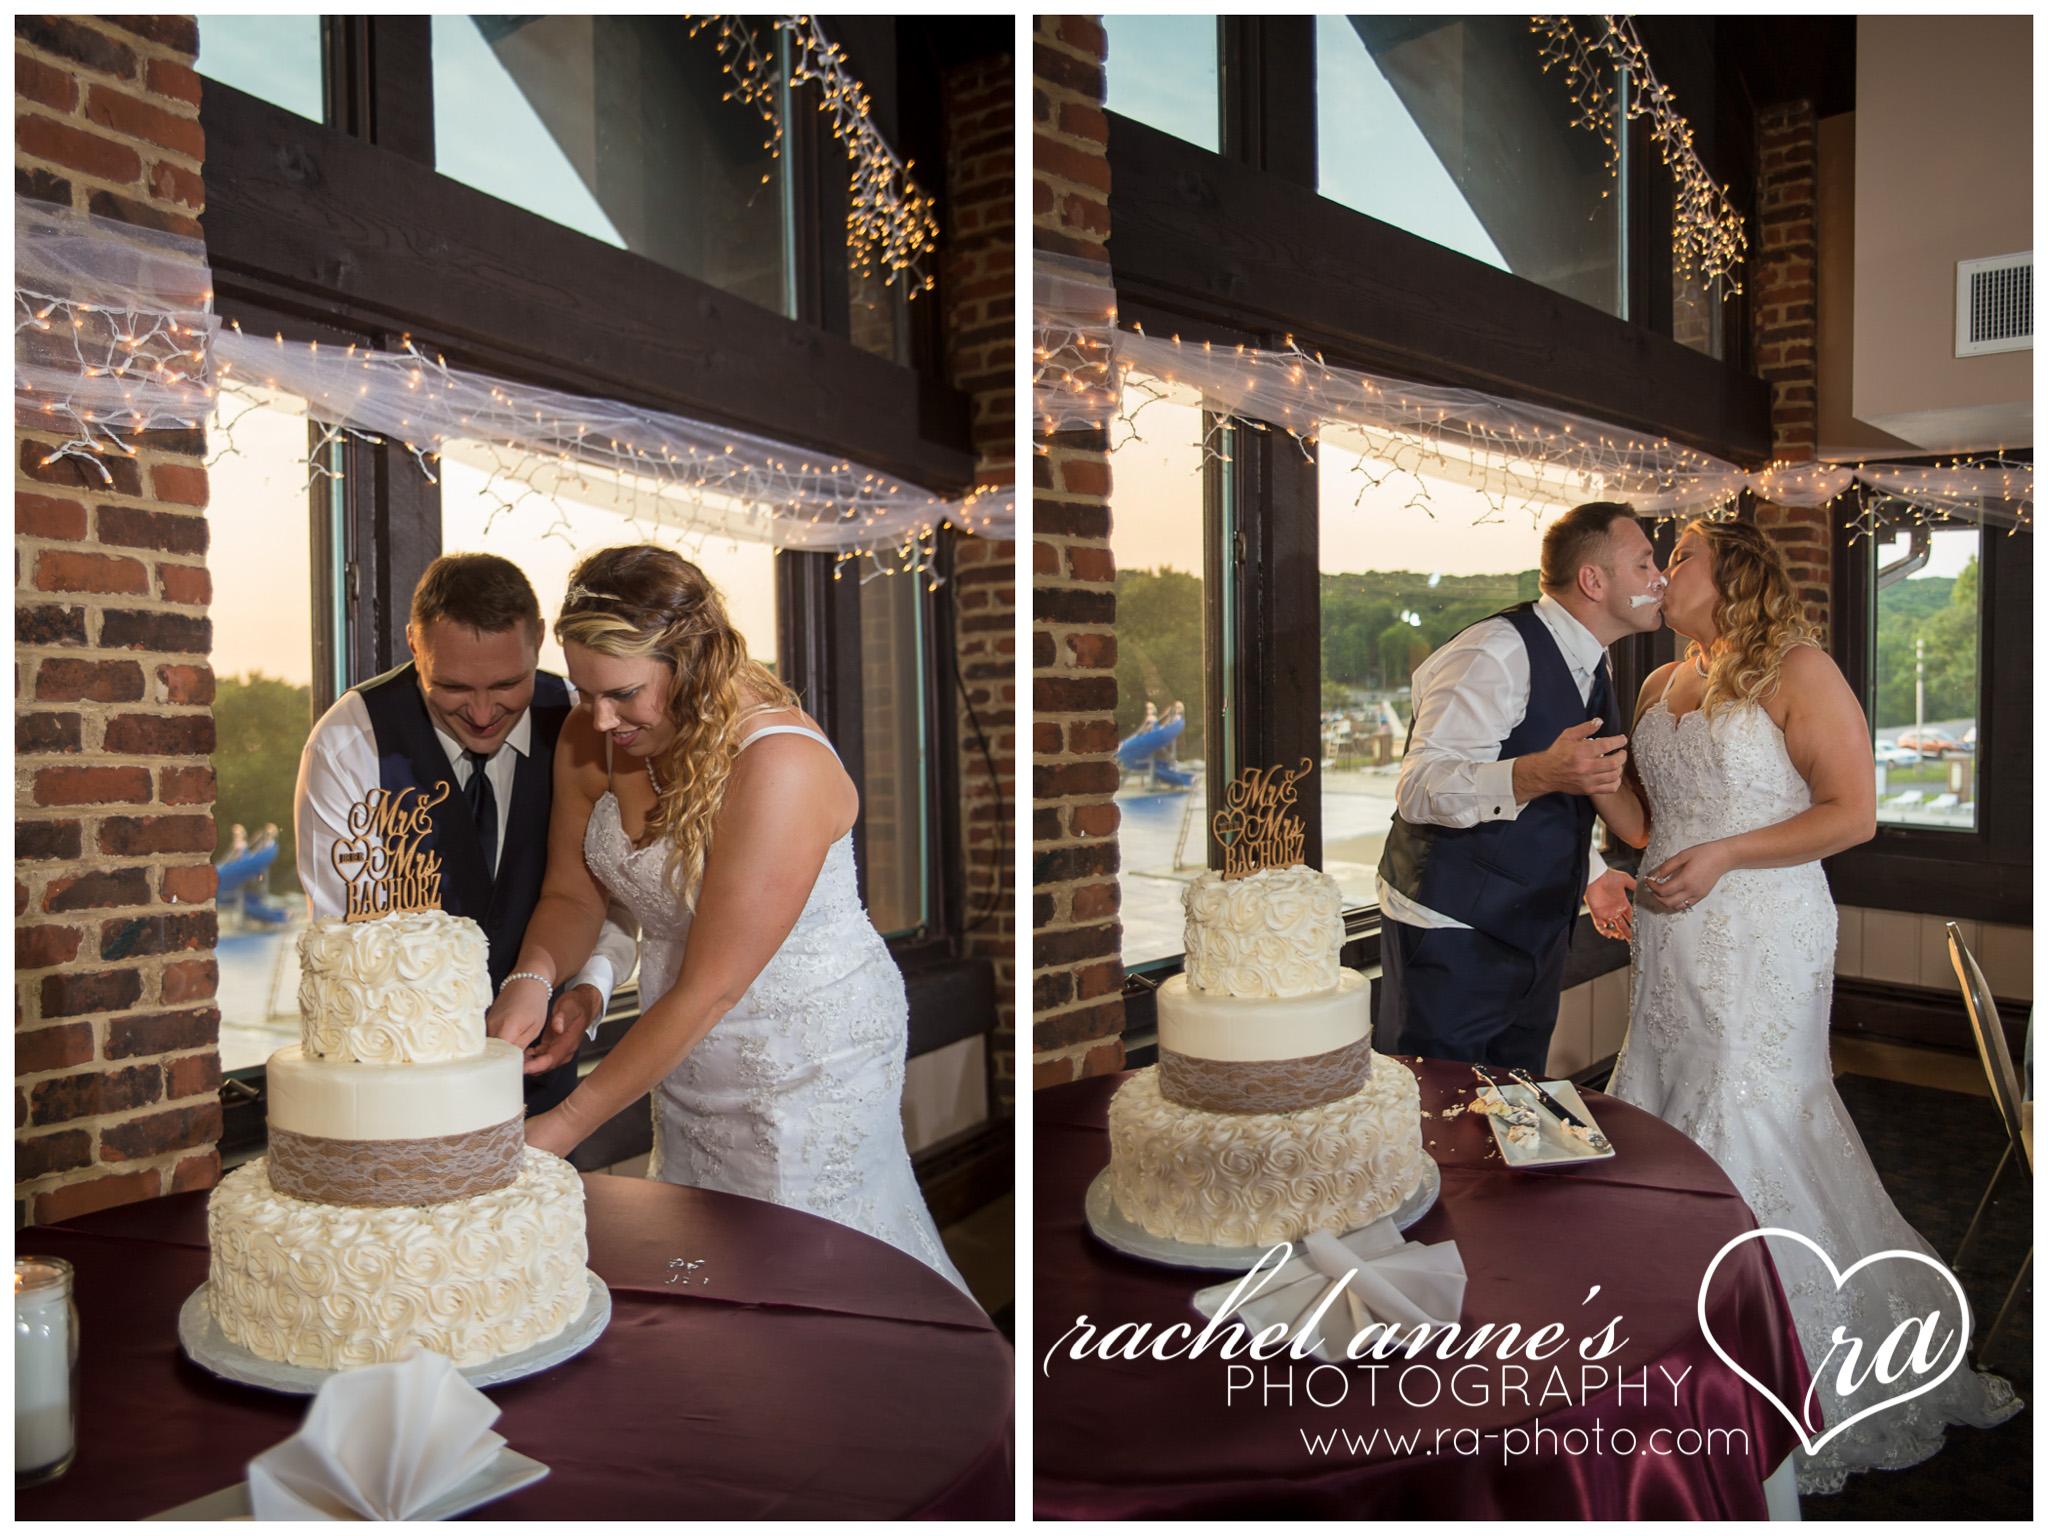 060-MAB-TREASURE-LAKE-CHURCH-LODGE-PA-WEDDINGS.jpg